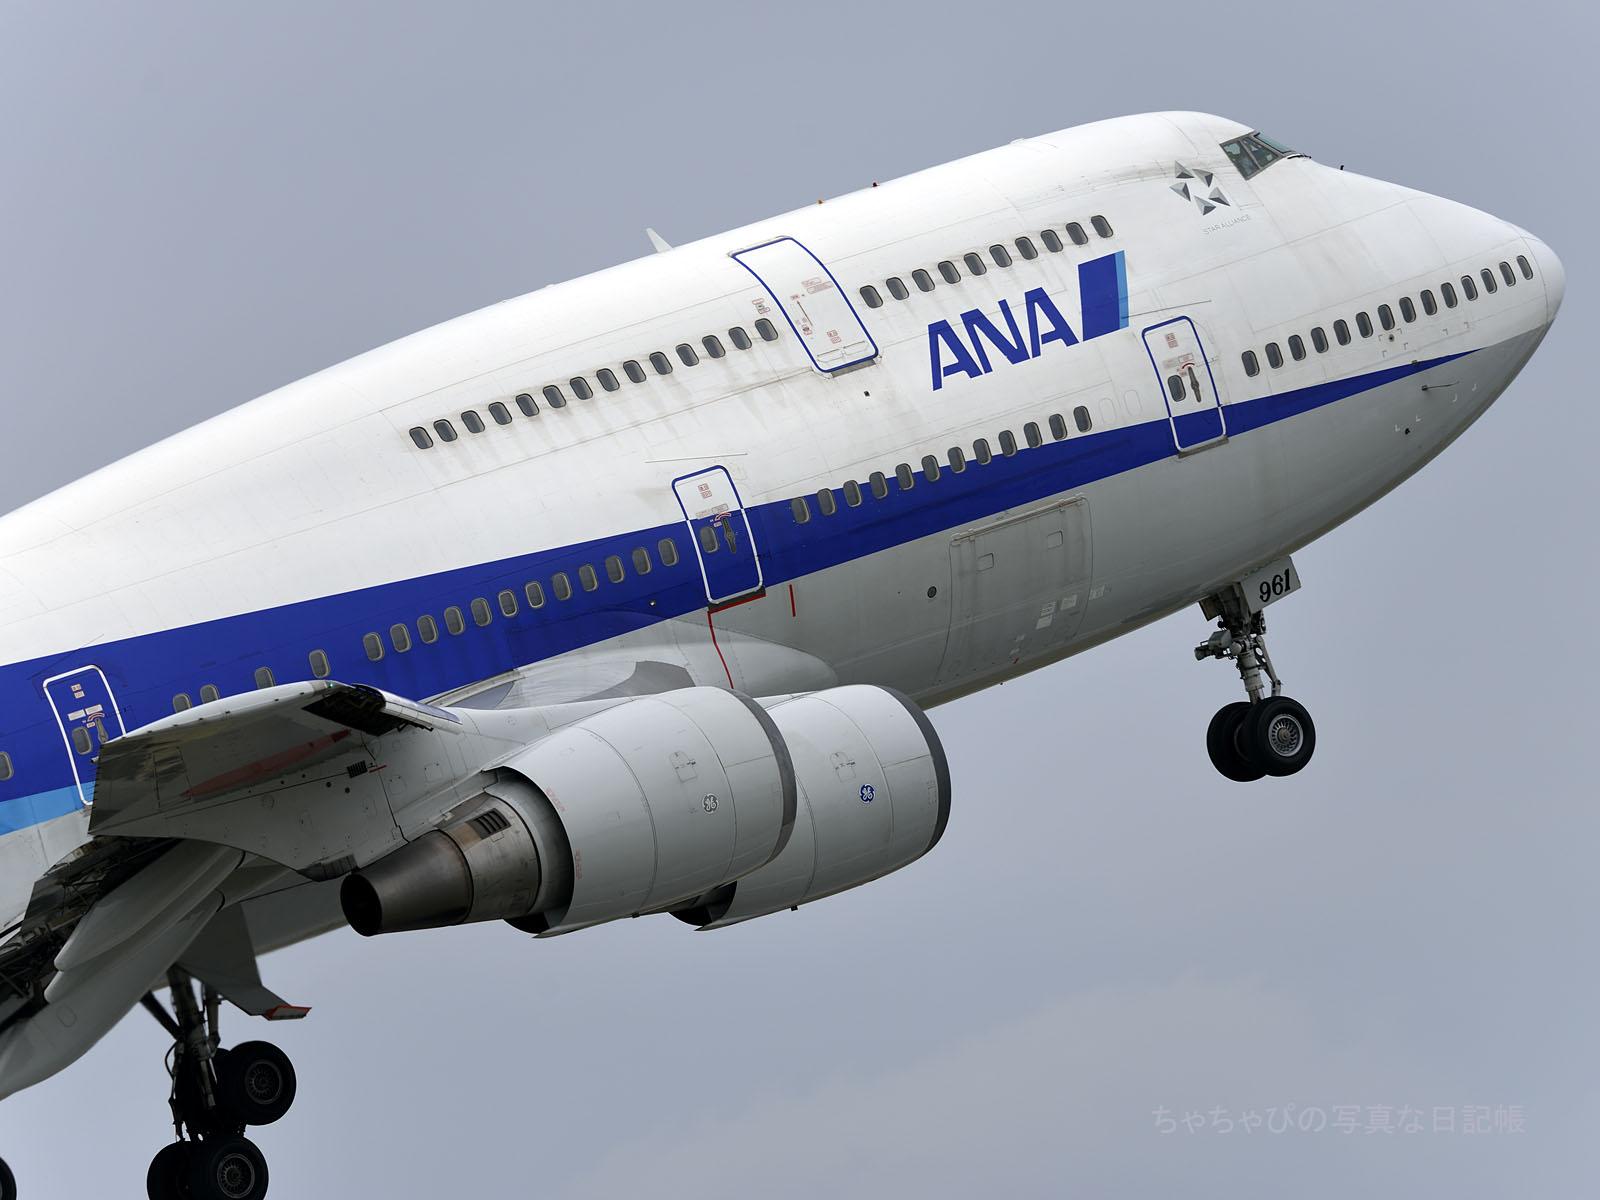 ANA B747-400D JA8961